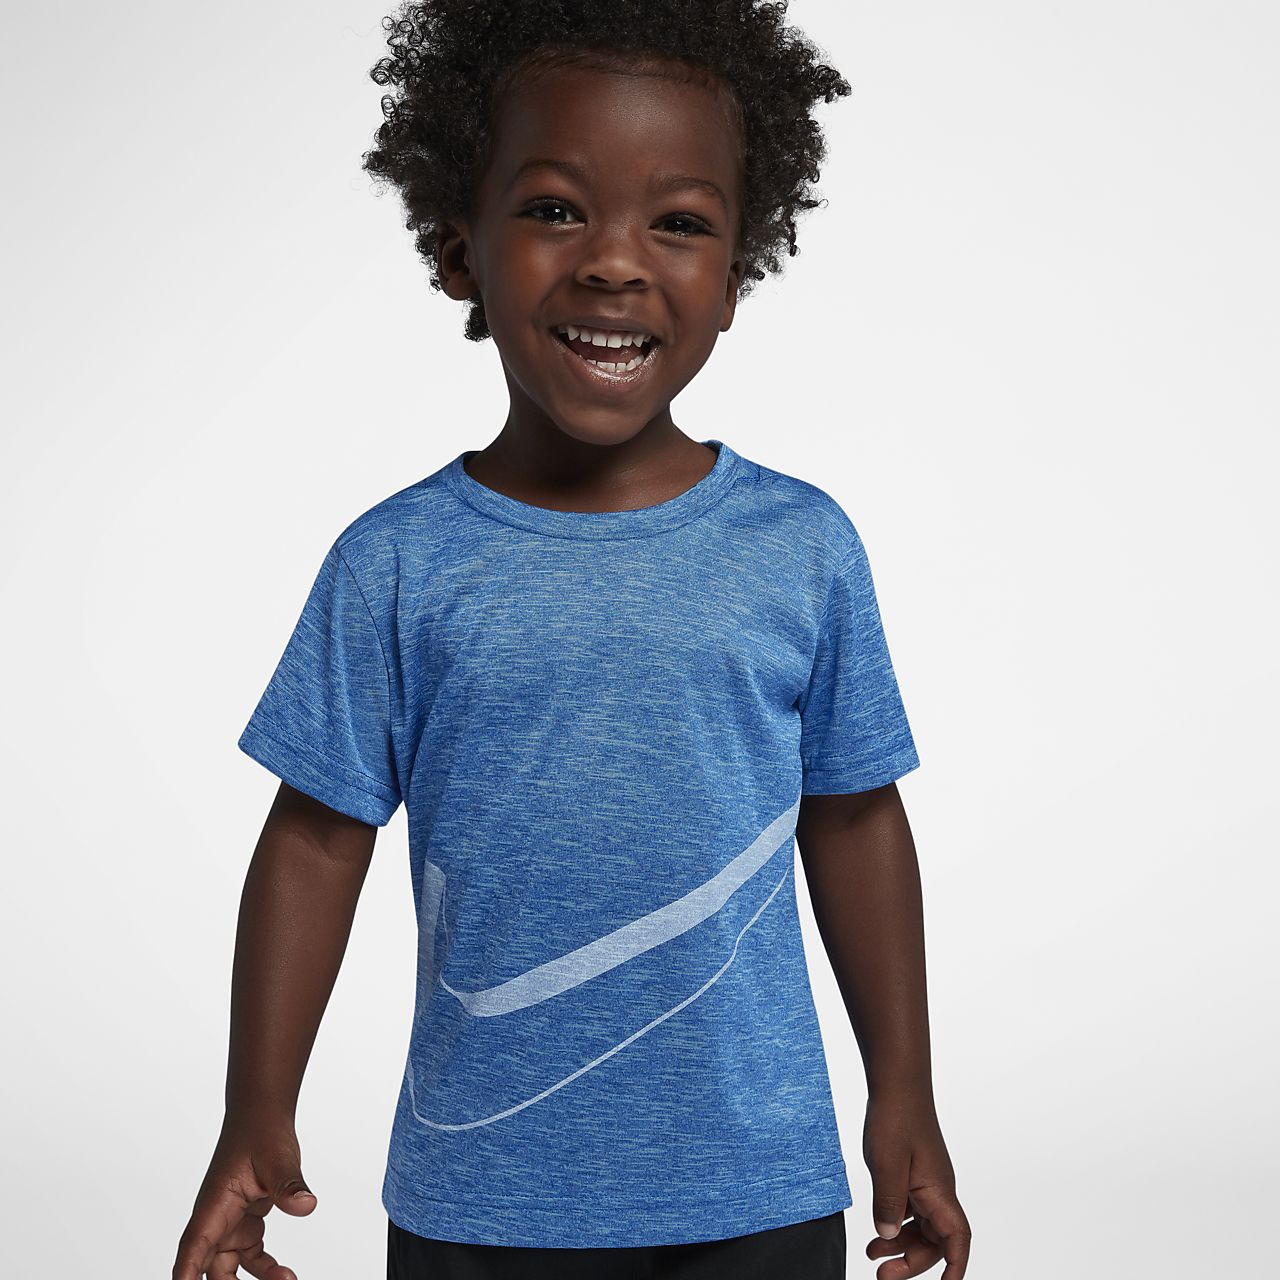 Tričko Nike Breathe pro batolata